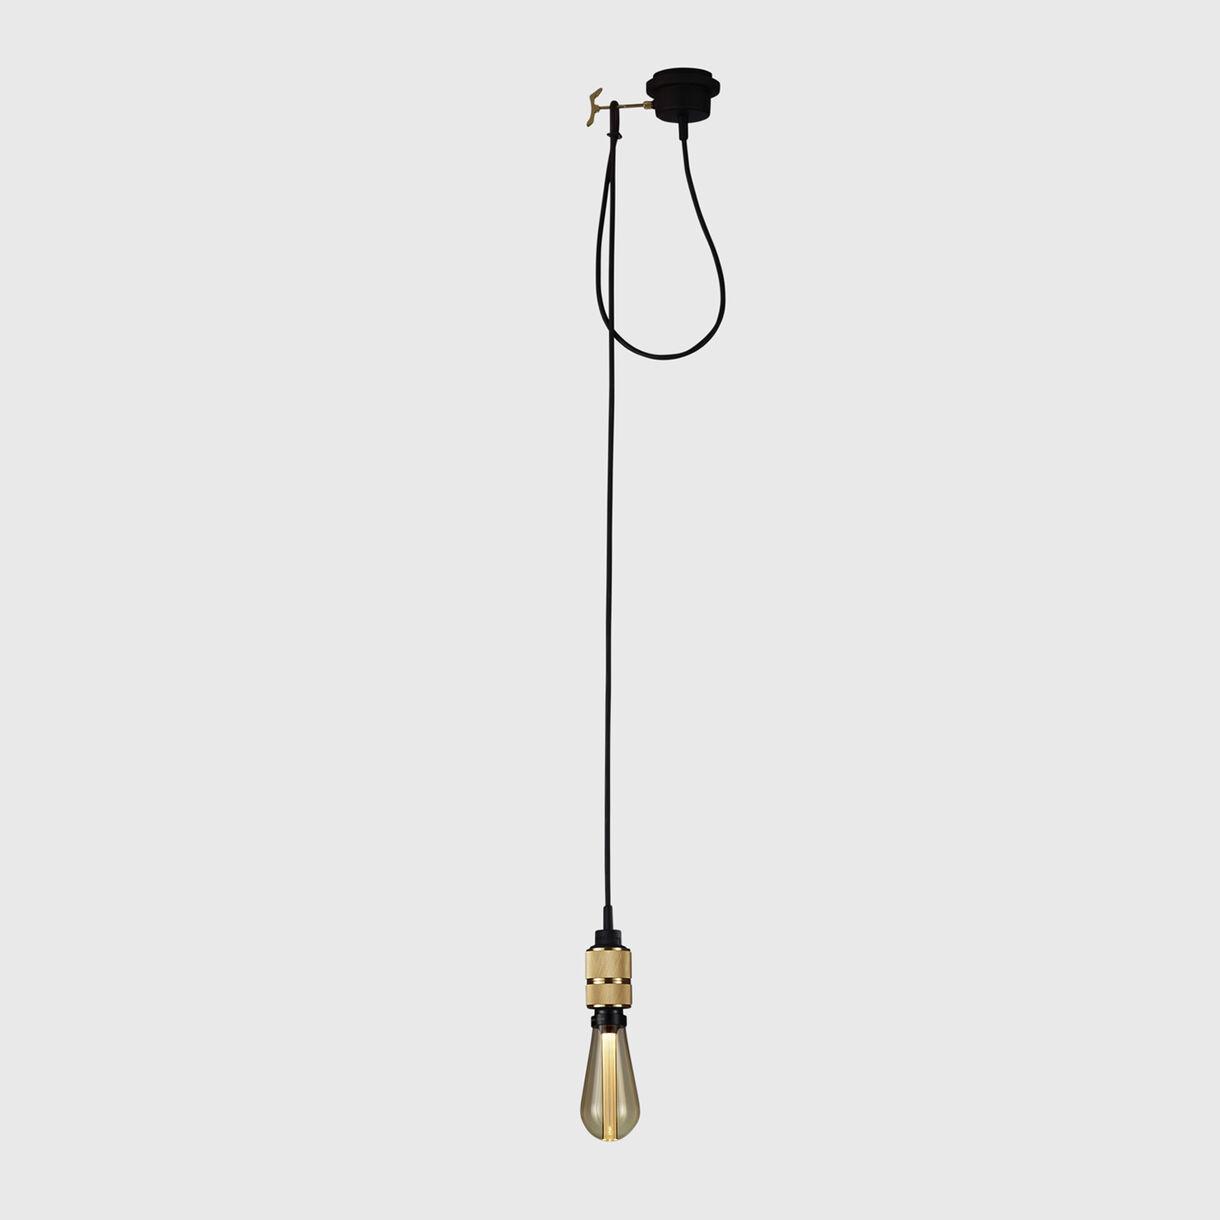 Hooked Pendant, Brass, Gold Bulb